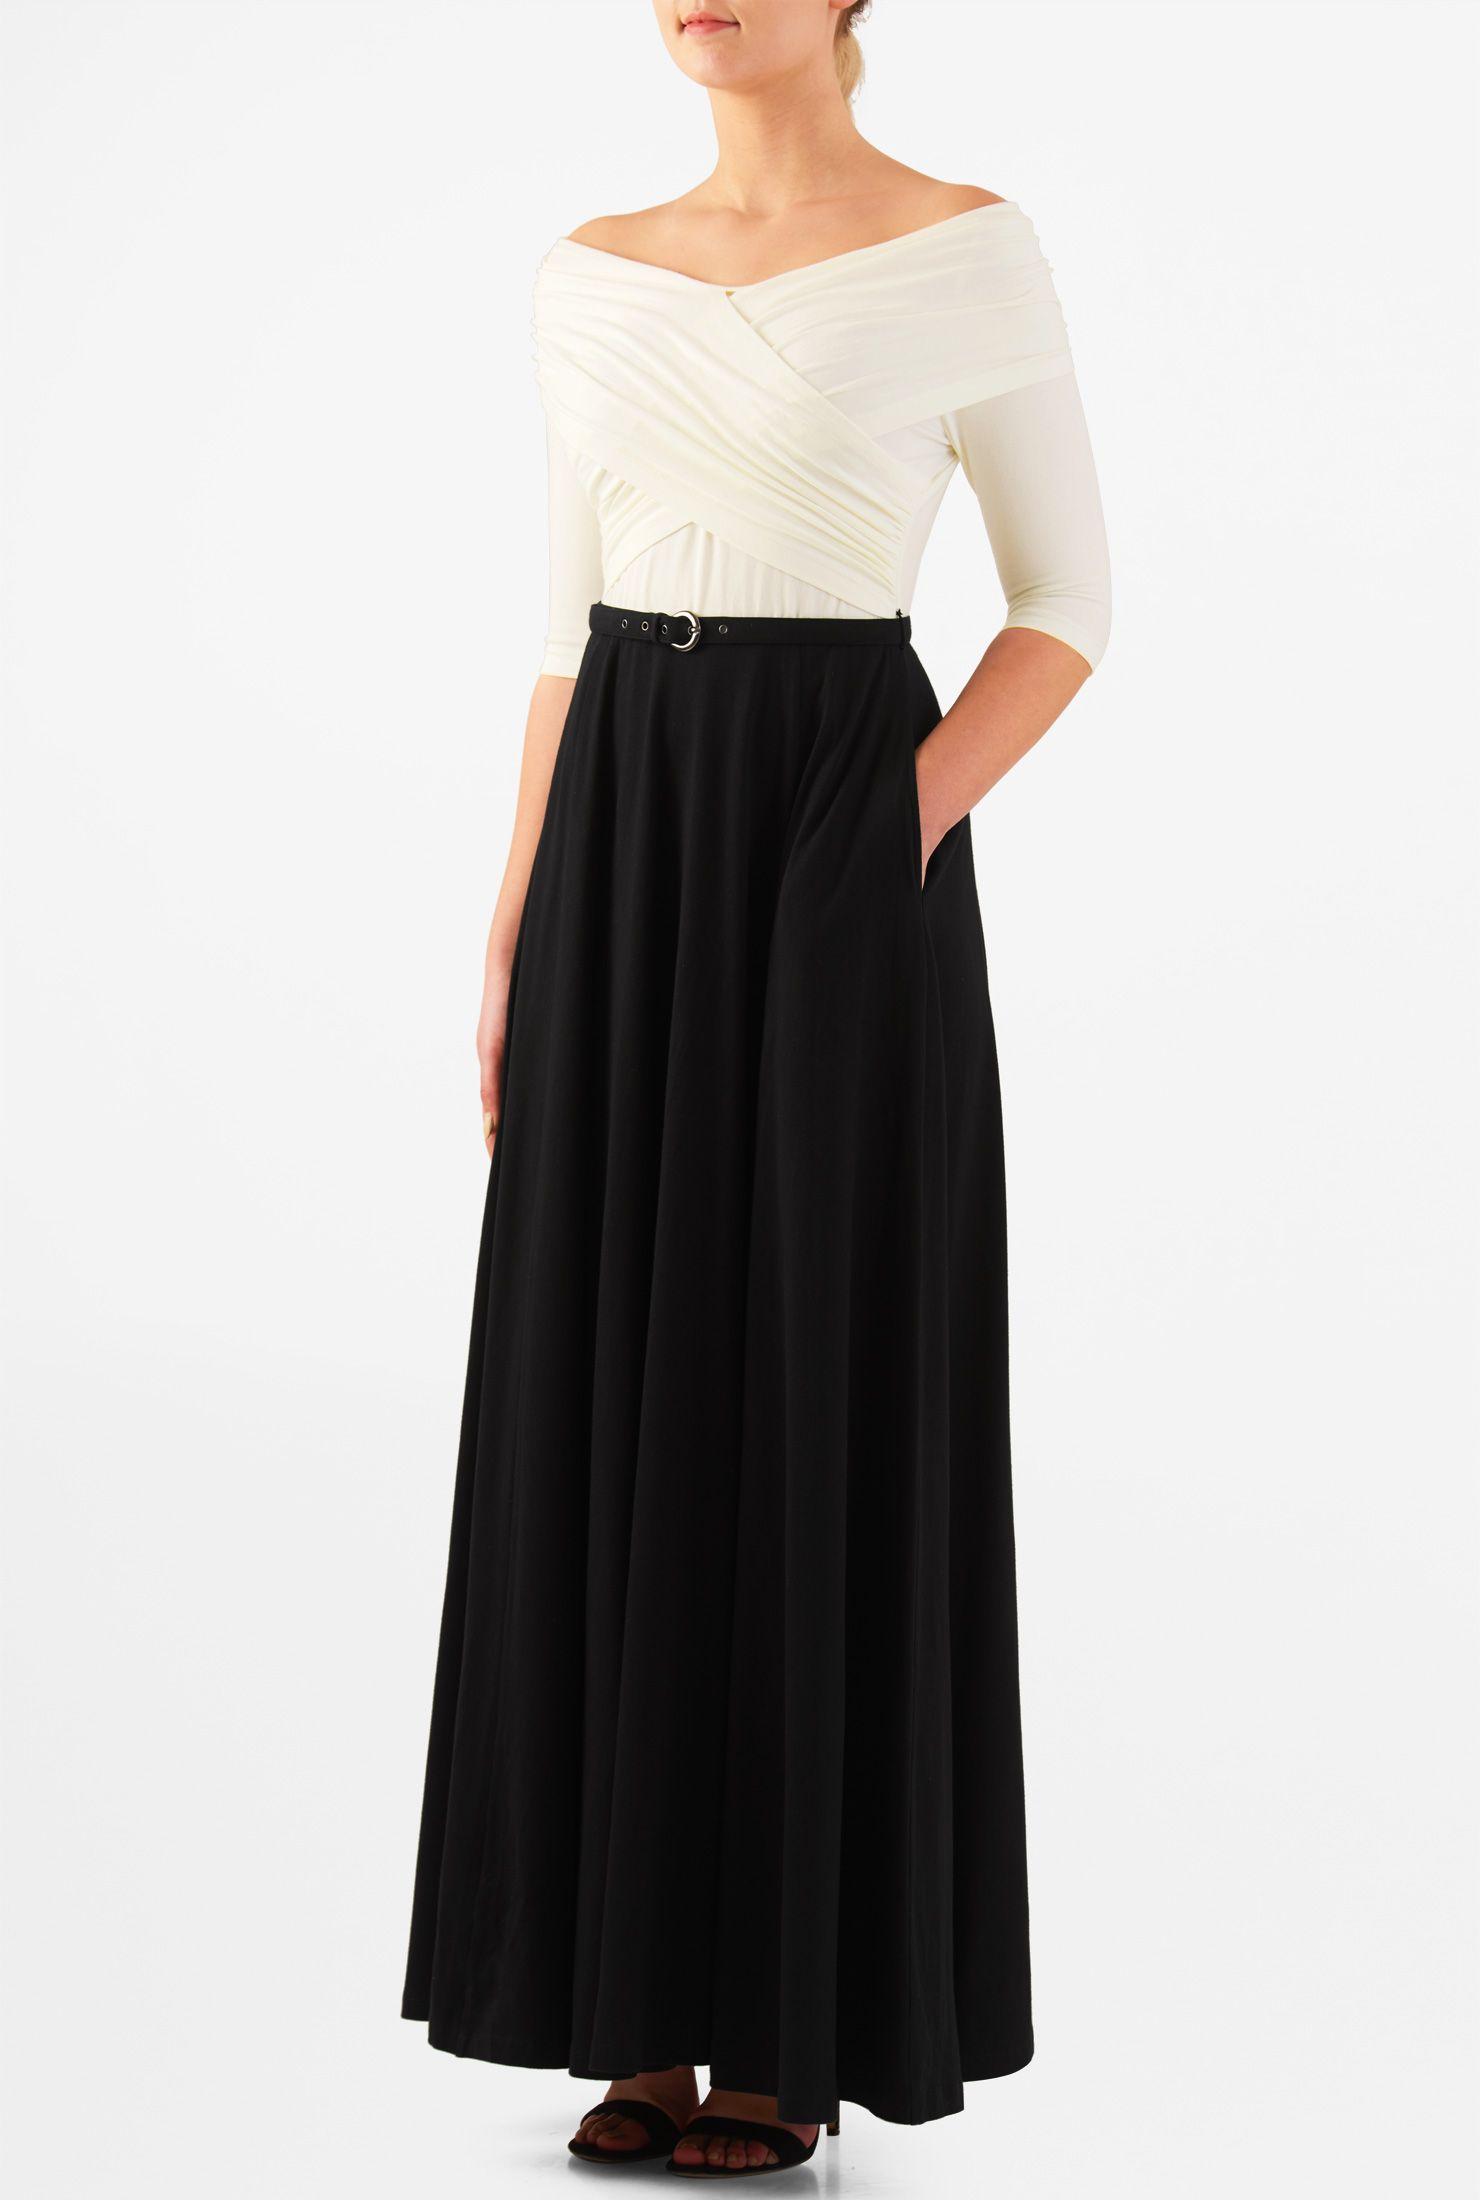 Black And White Dresses Boat Neck Maxi Dresses Cotton Spandex